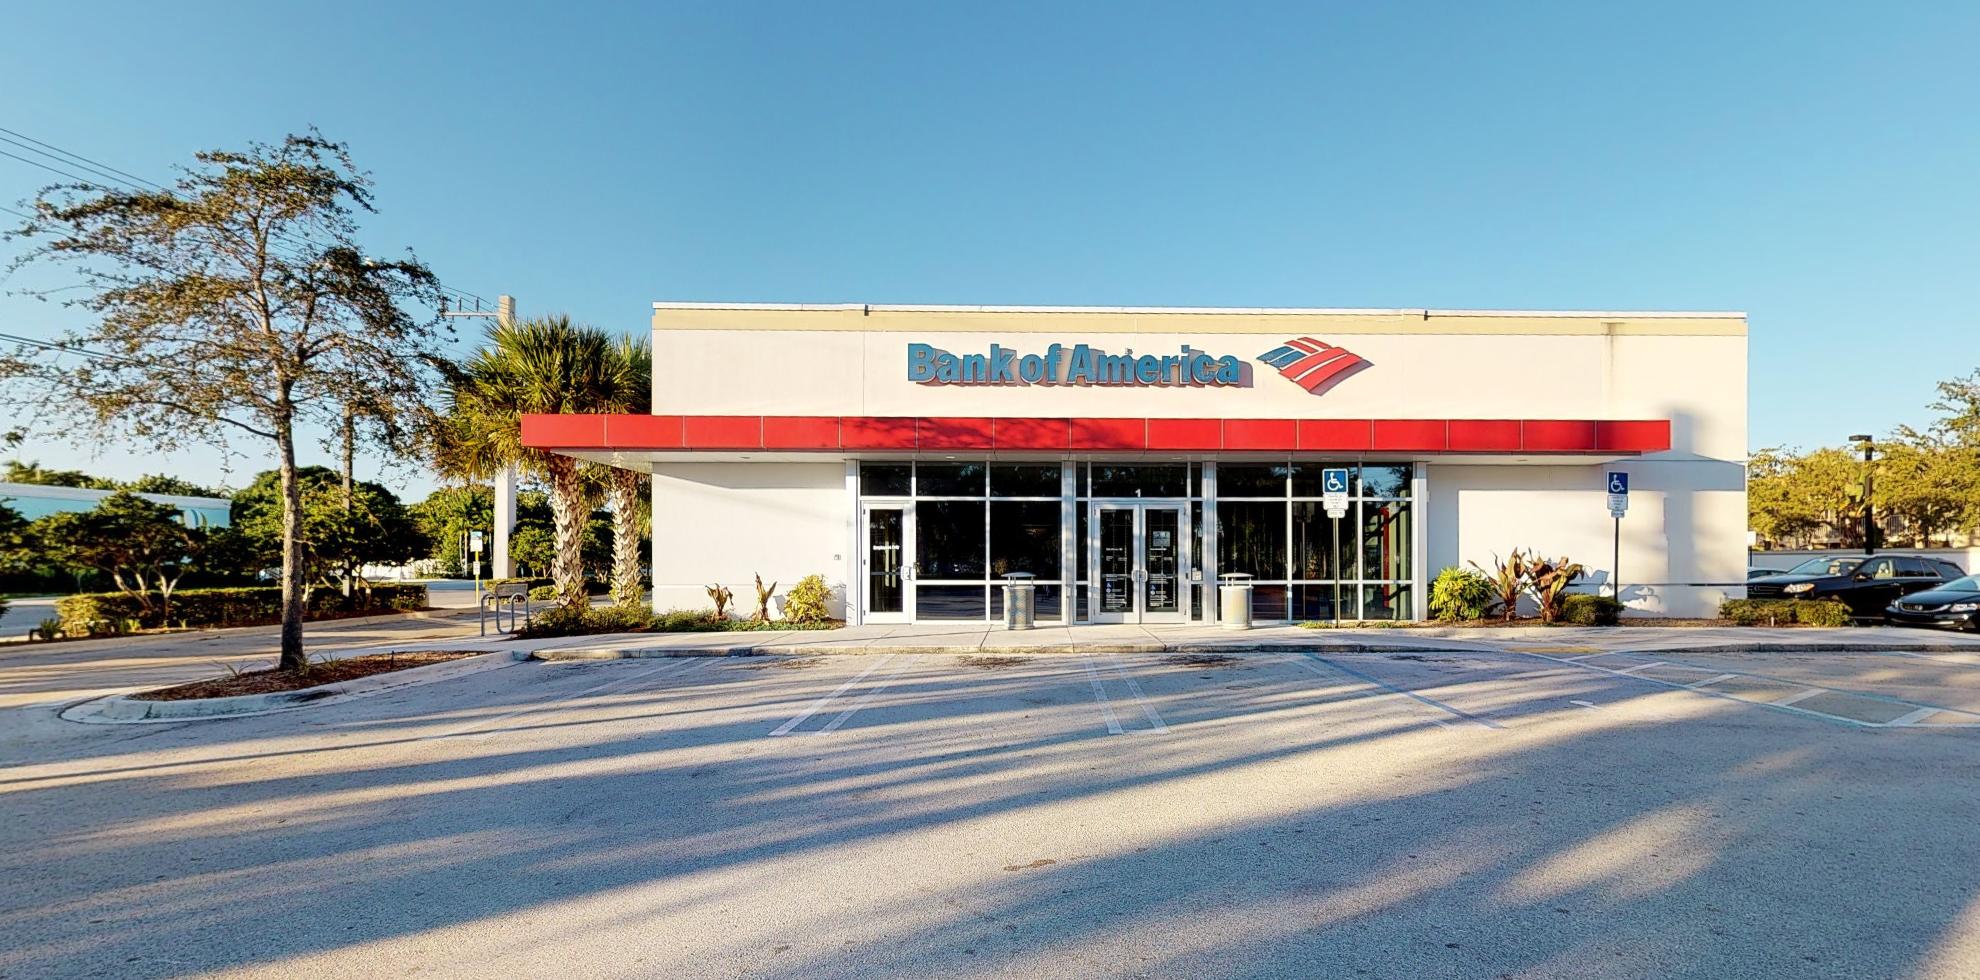 Bank of America financial center with drive-thru ATM   1 E McNab Rd, Pompano Beach, FL 33060